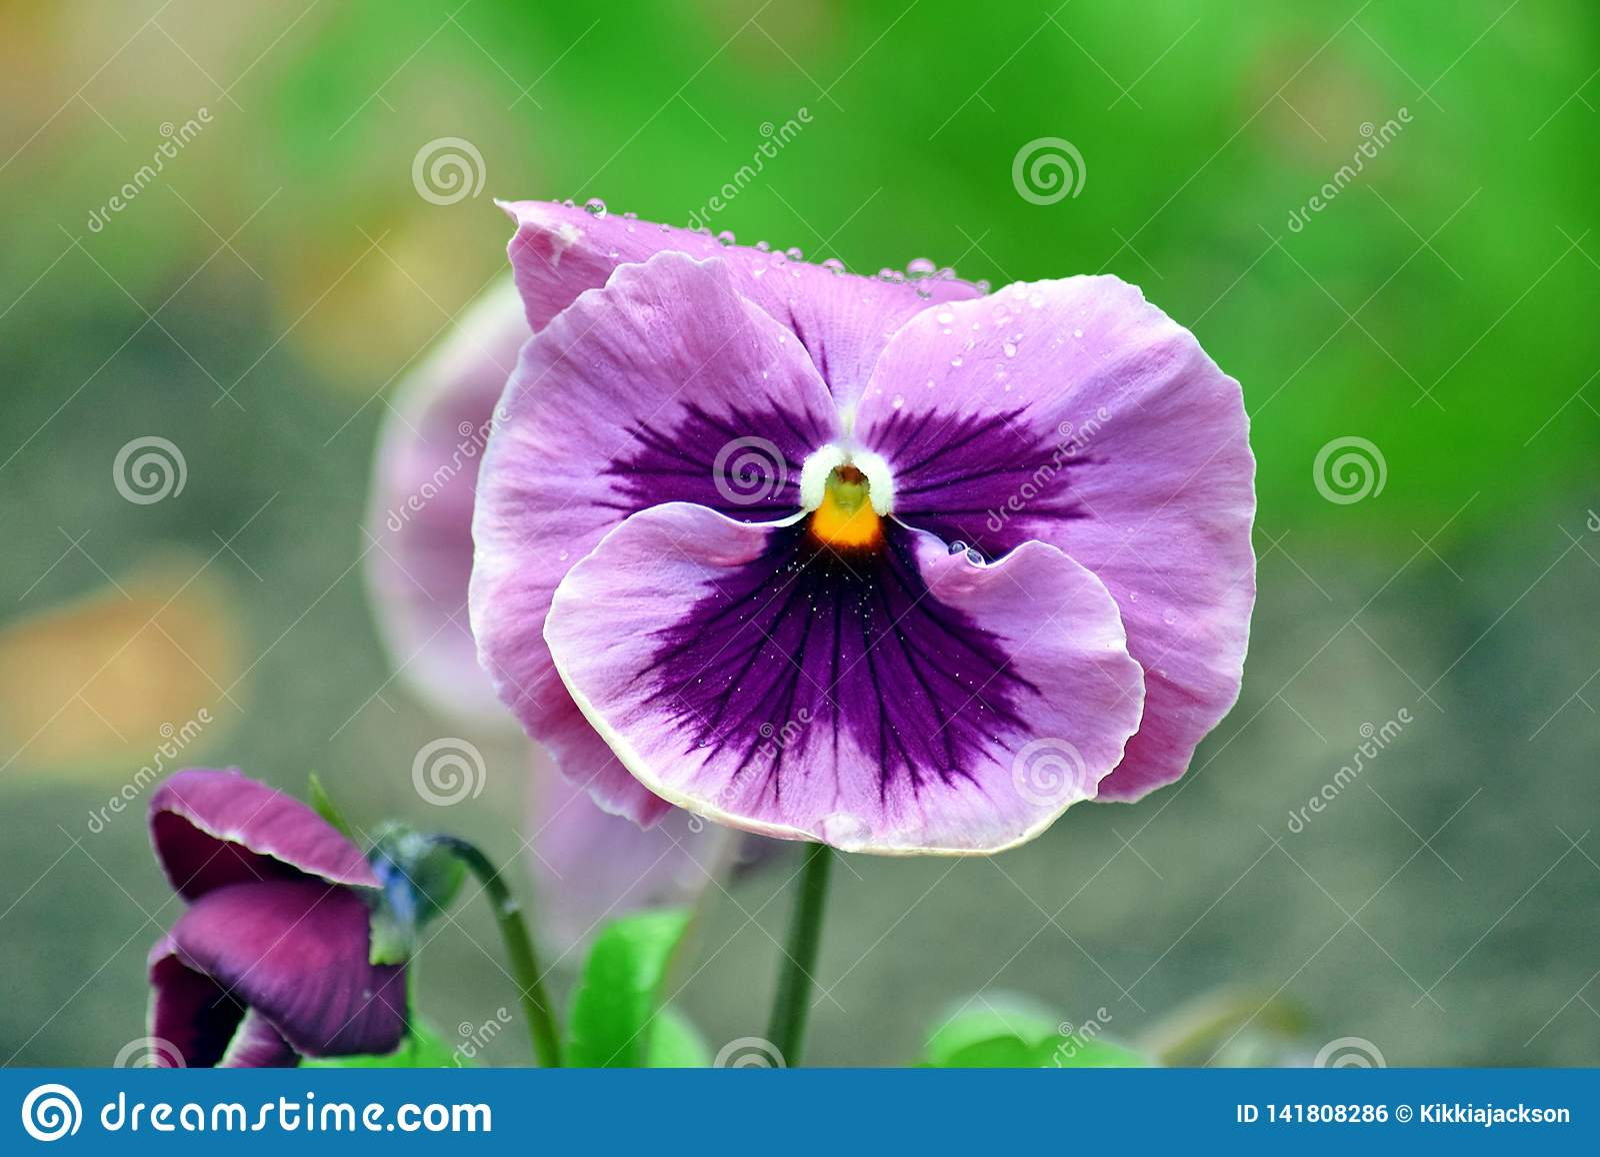 Viola Tricolor Hortensis Flowers Home Gardening Plants Stock Photo